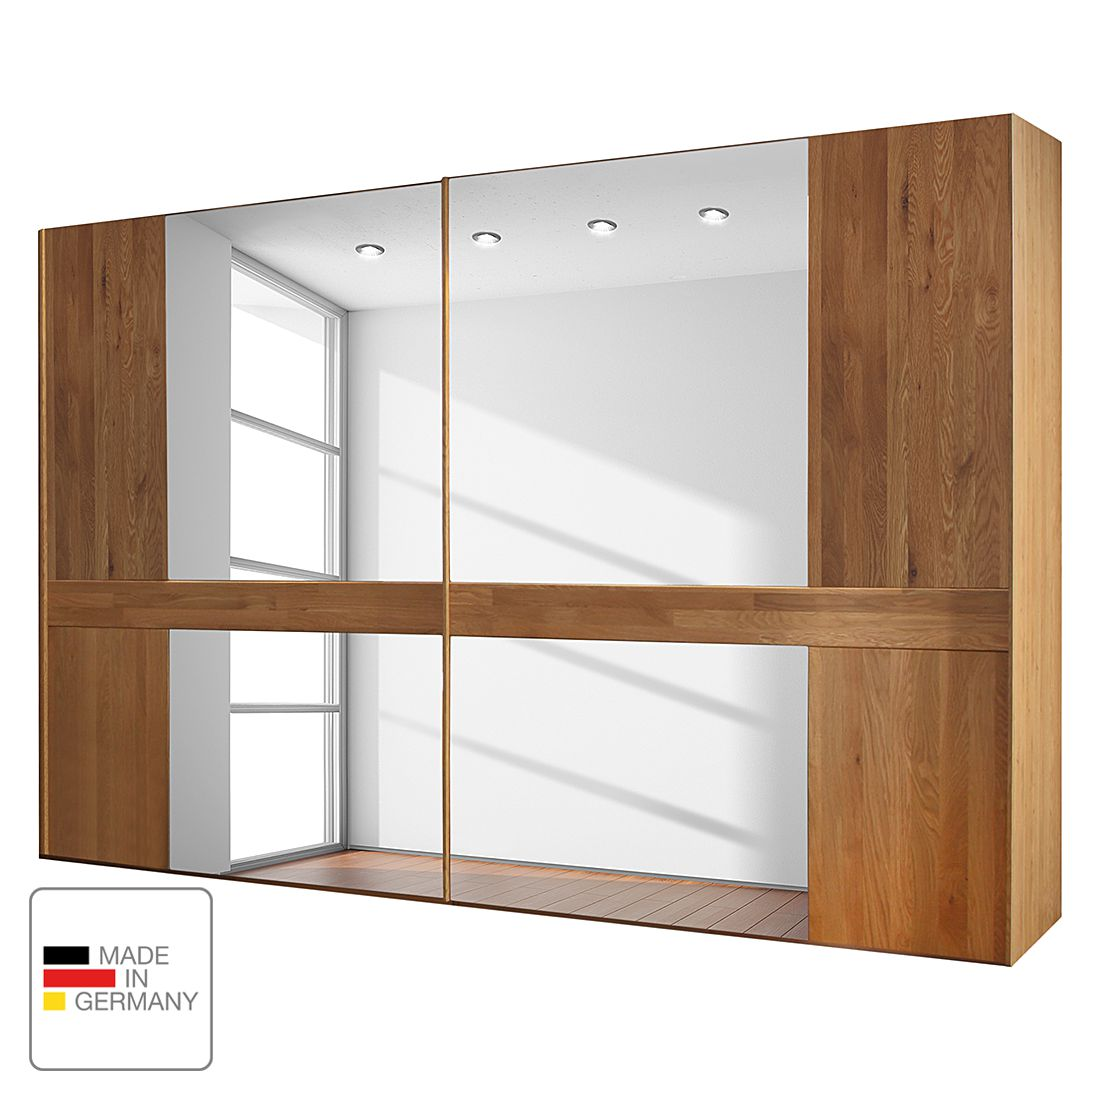 Schuifdeurkast Faro - gelakt massief eikenhout - 250cm (2-deurs) - Zonder Passe-partout lijst, Wiemann